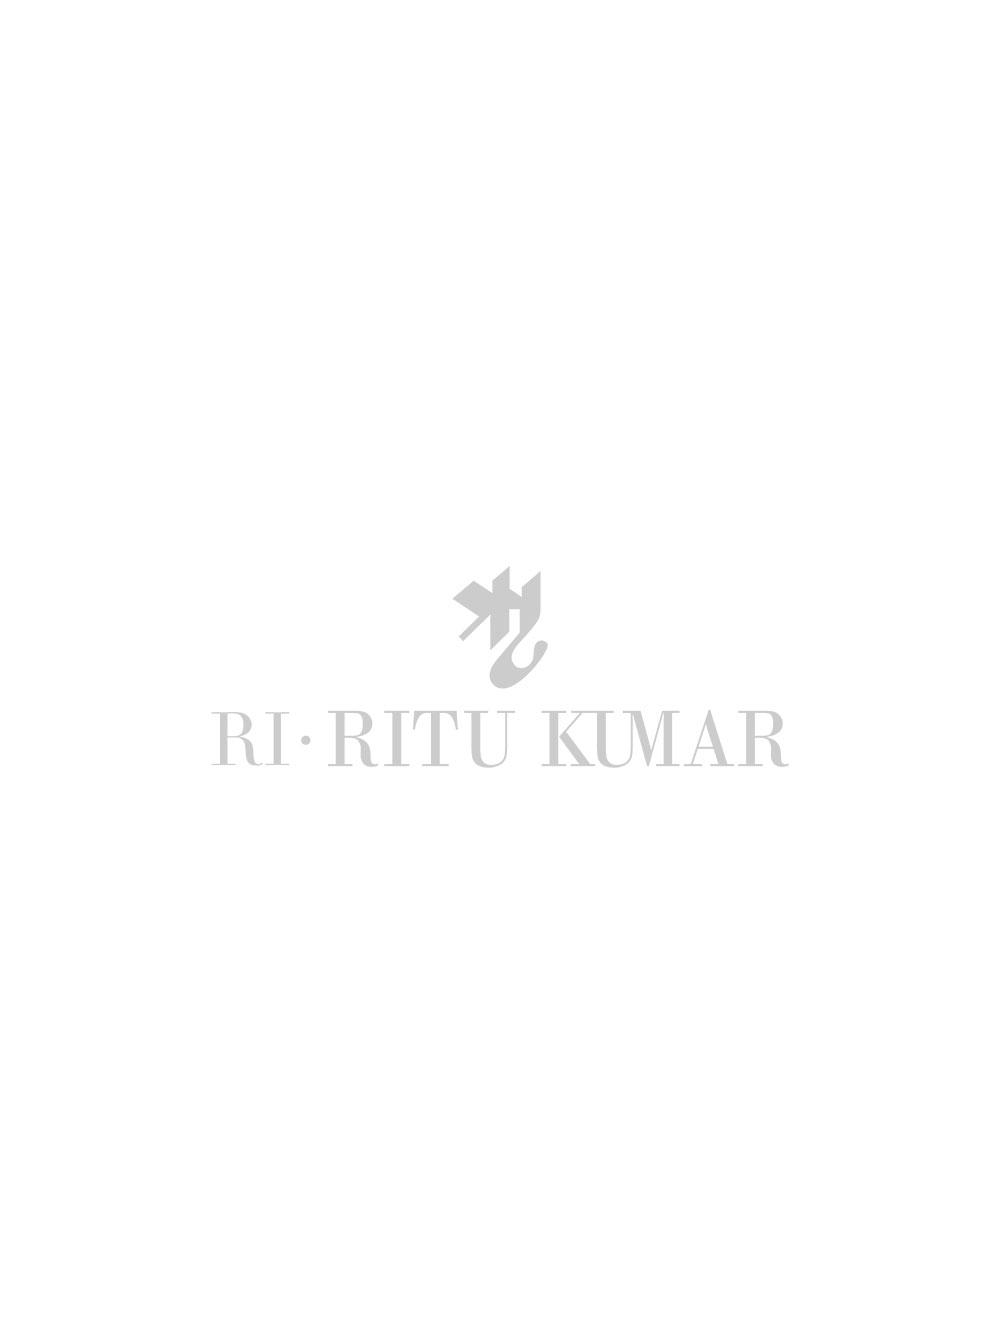 Priyanka Chopra In Ritu Kumar